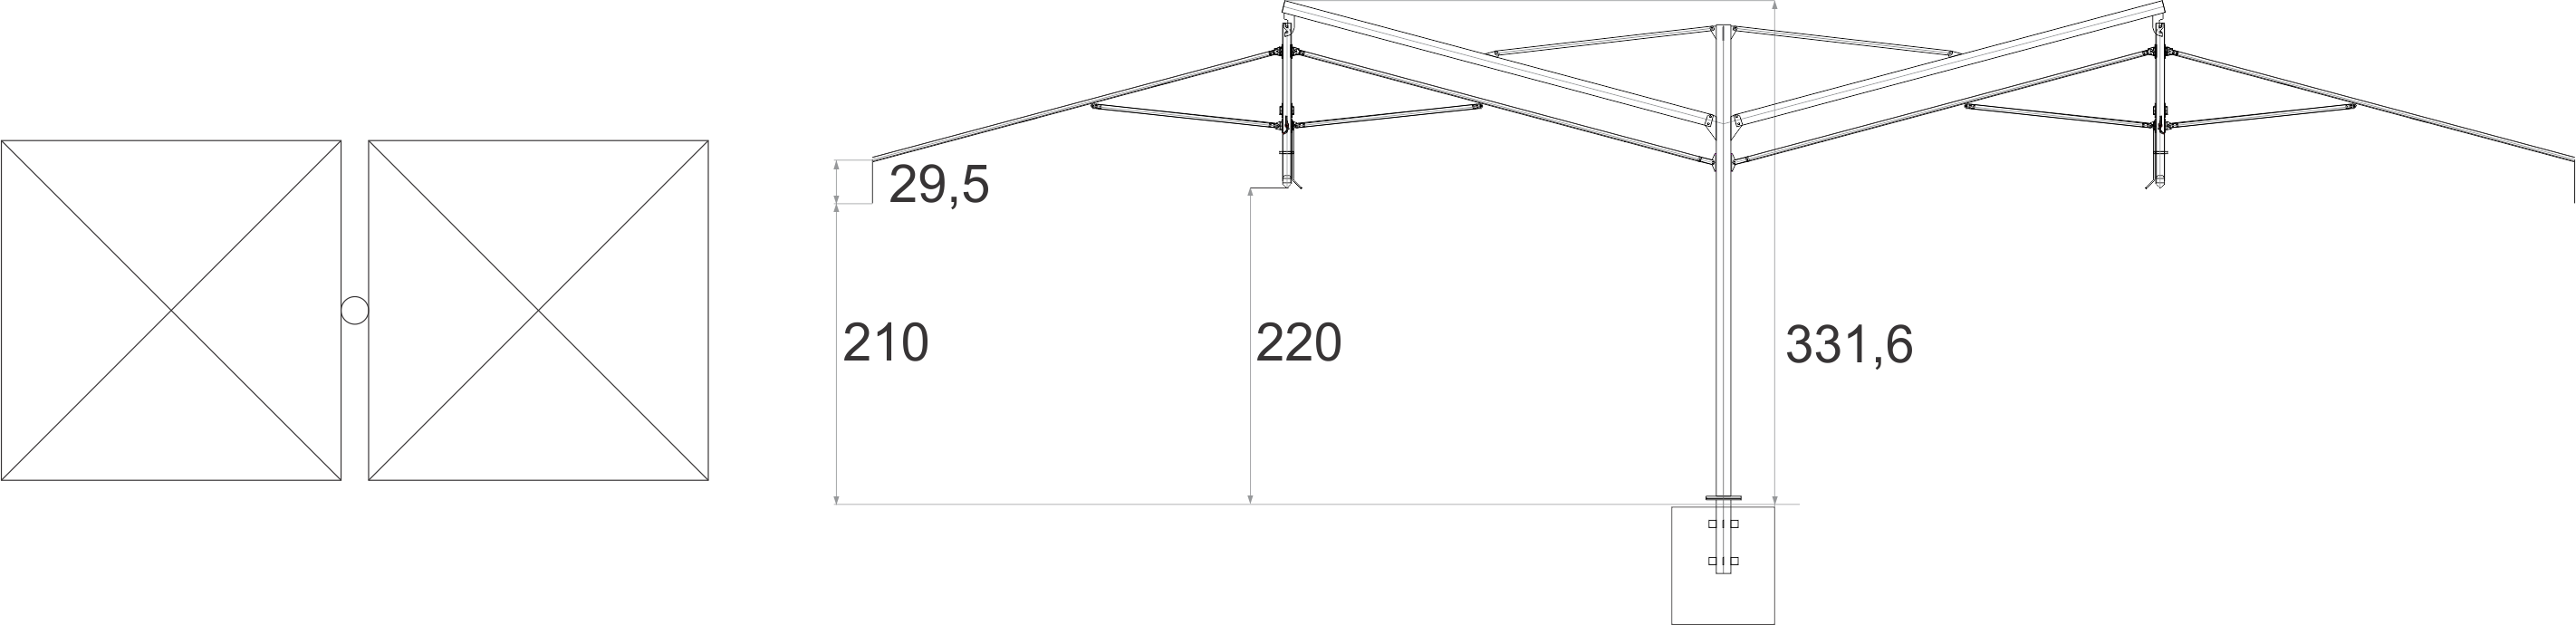 1557423868-console-duo-oznaka-visina-tabela-za-dimenzije.png